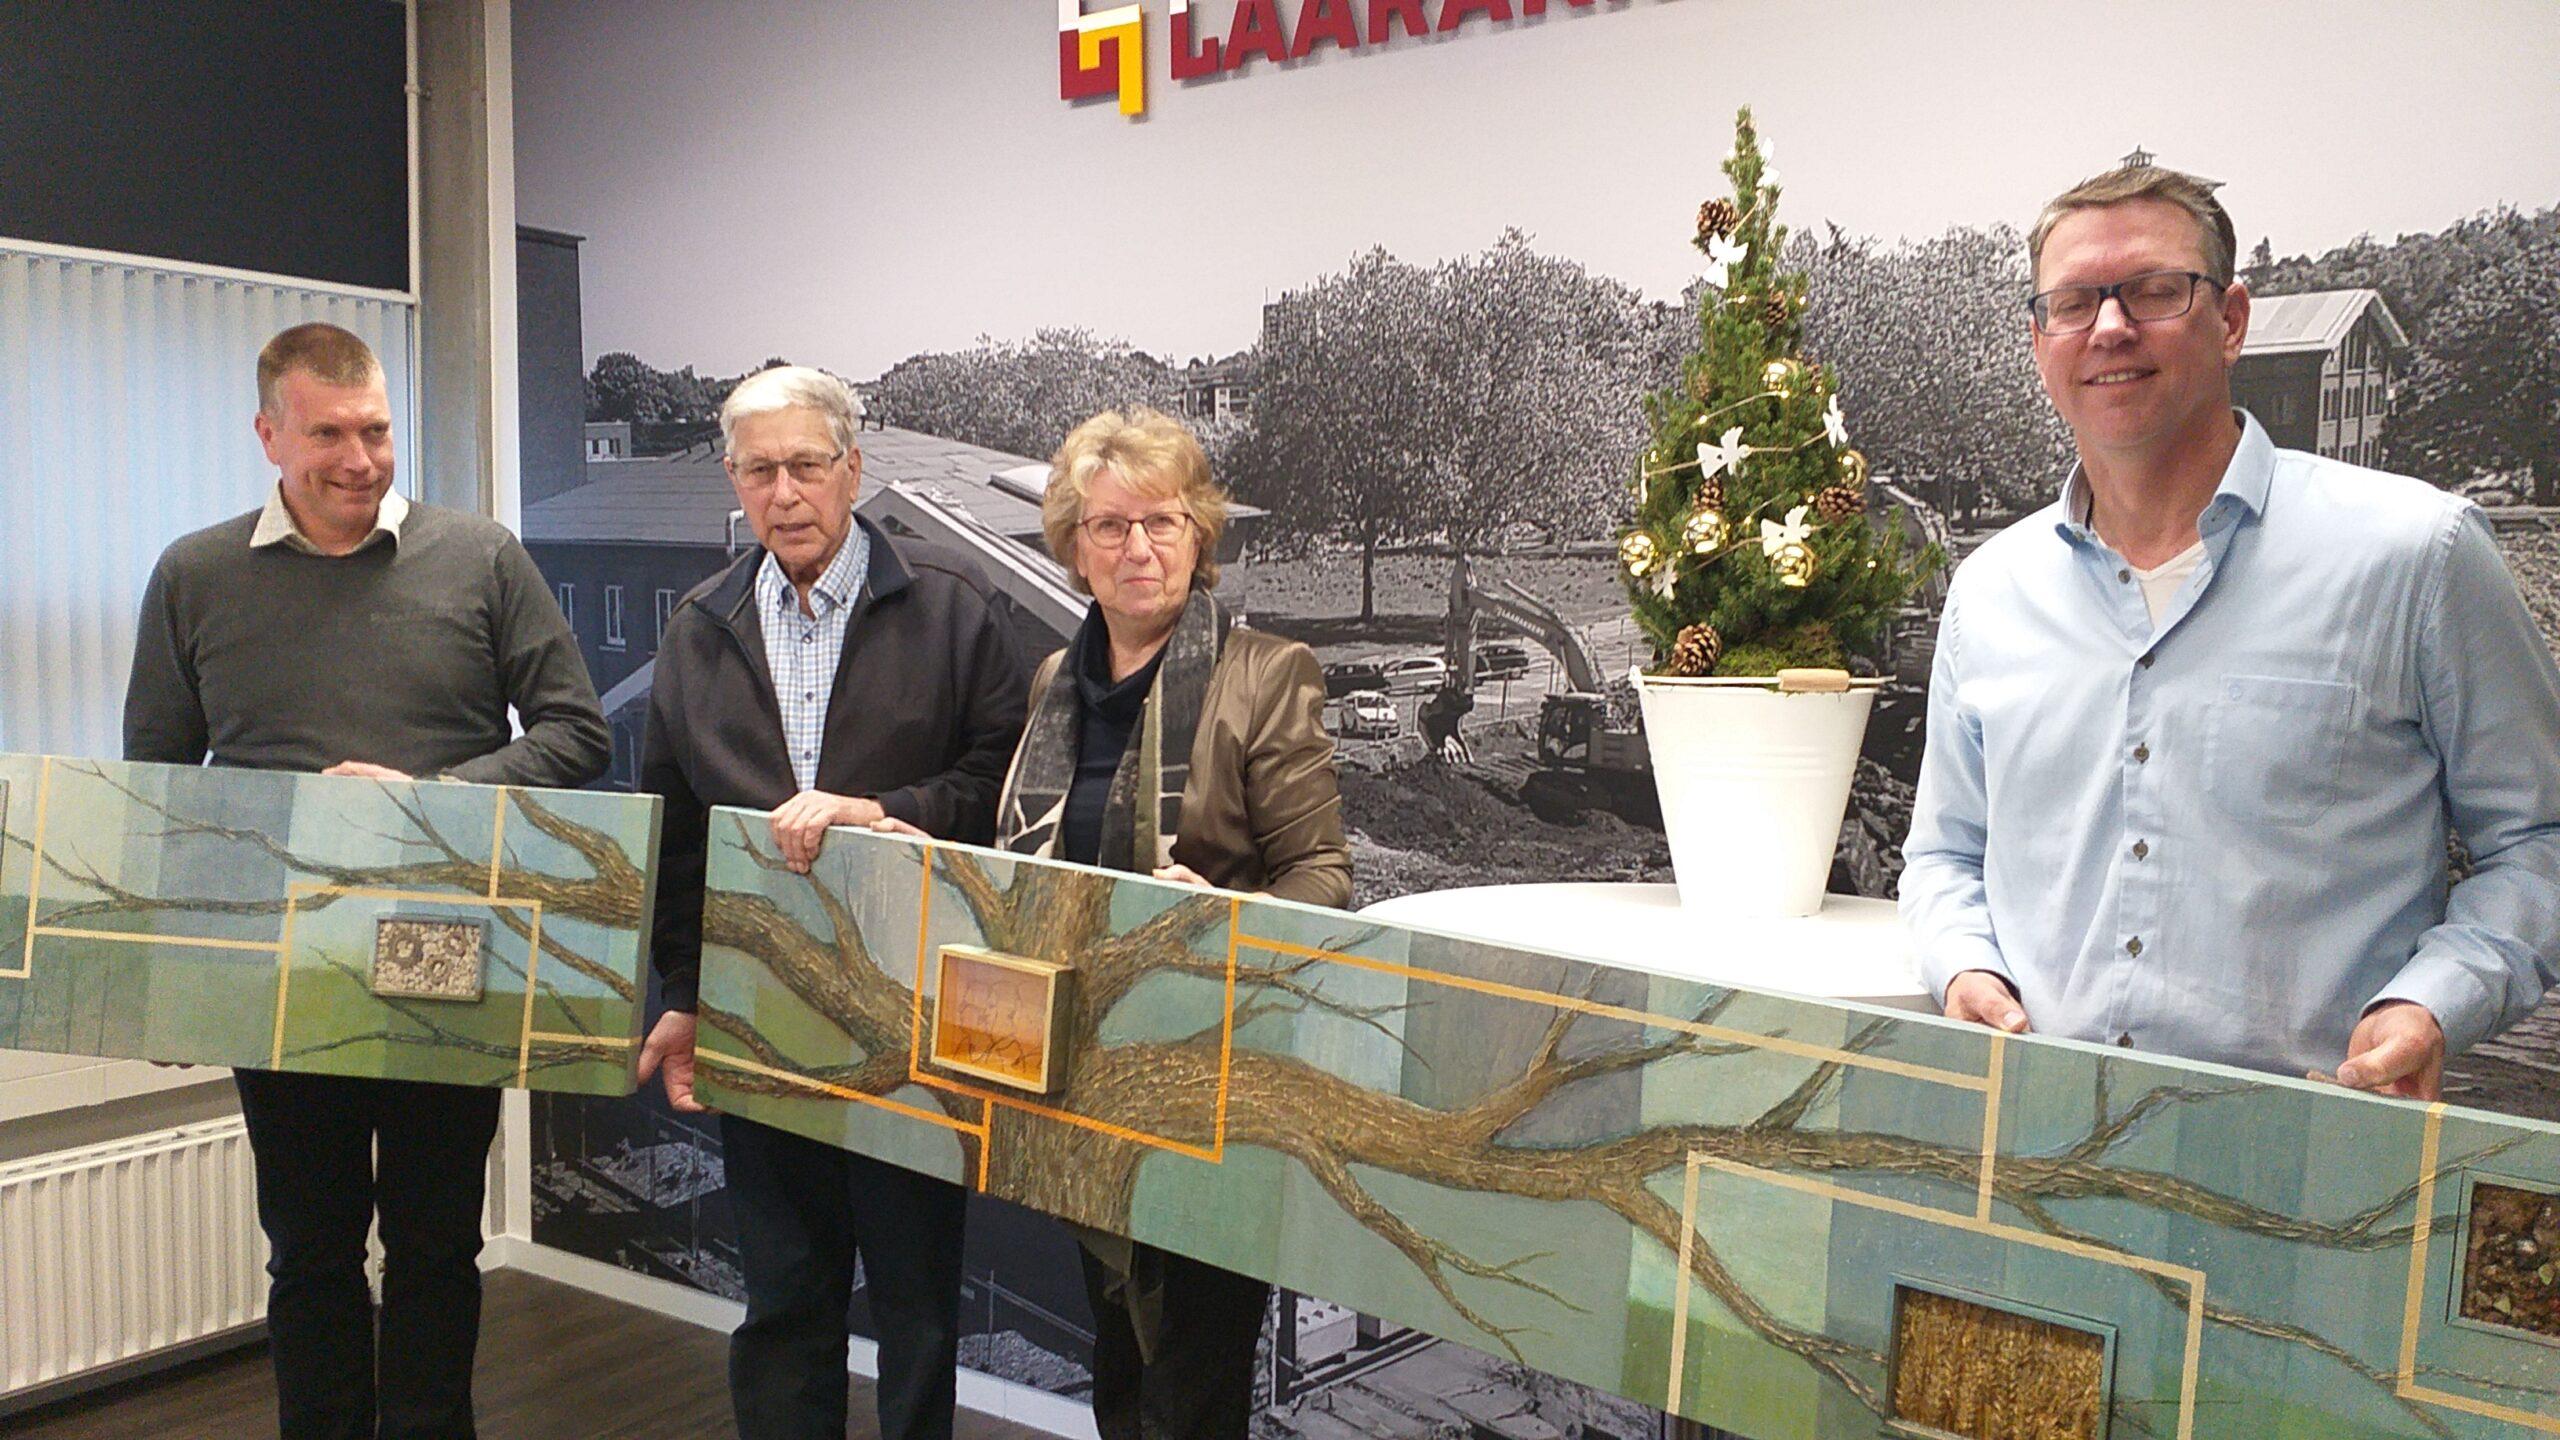 Laarakkers 75-Jahr-Feier